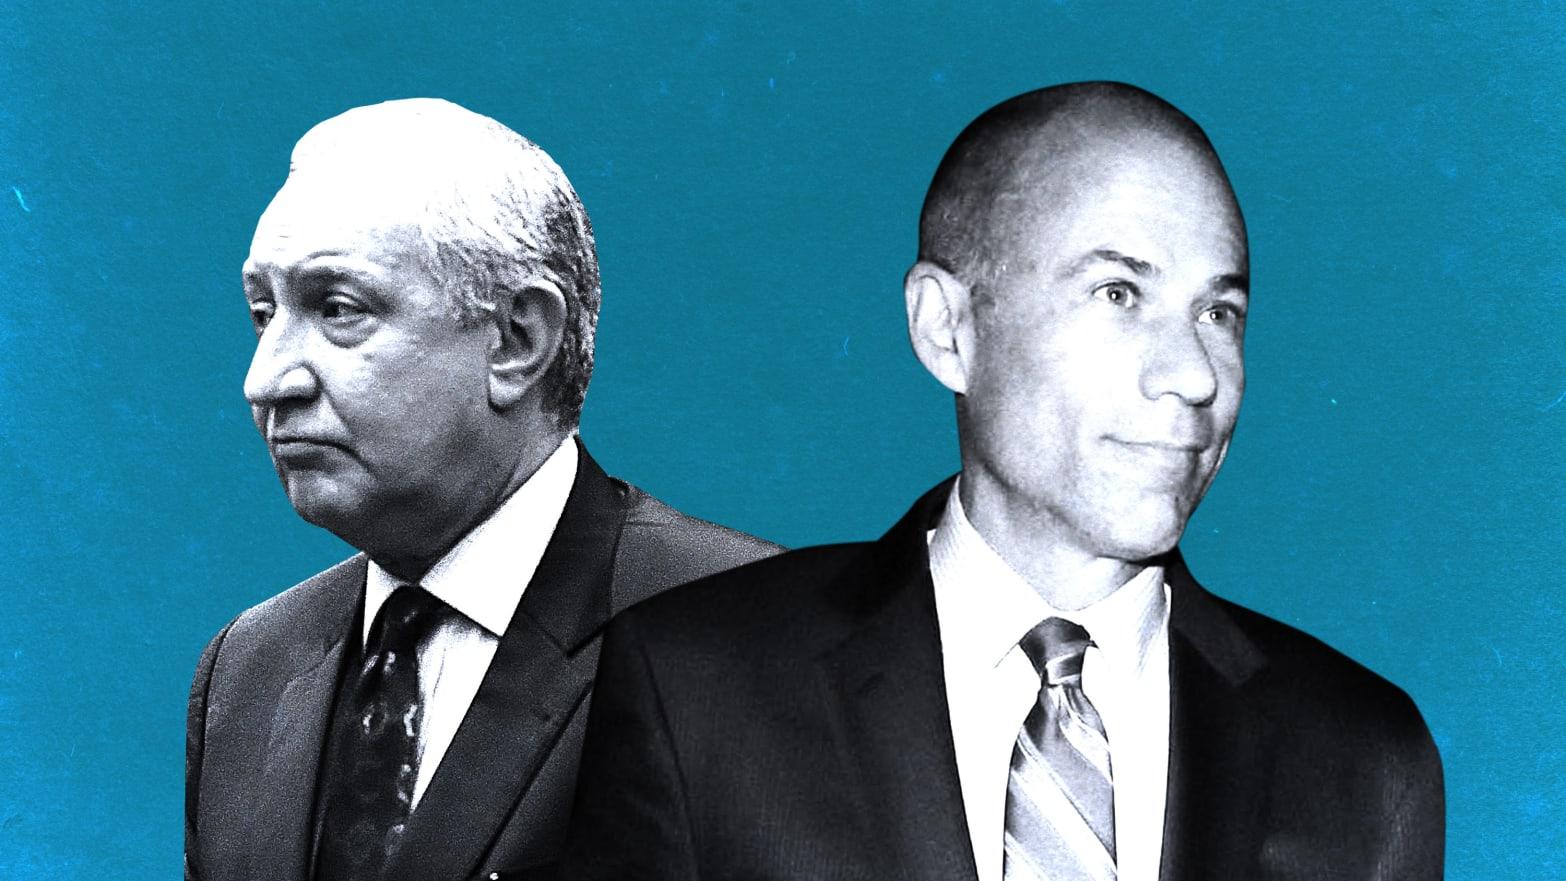 Mark Geragos, Michael Avenatti, and Their Many High-Profile Cases